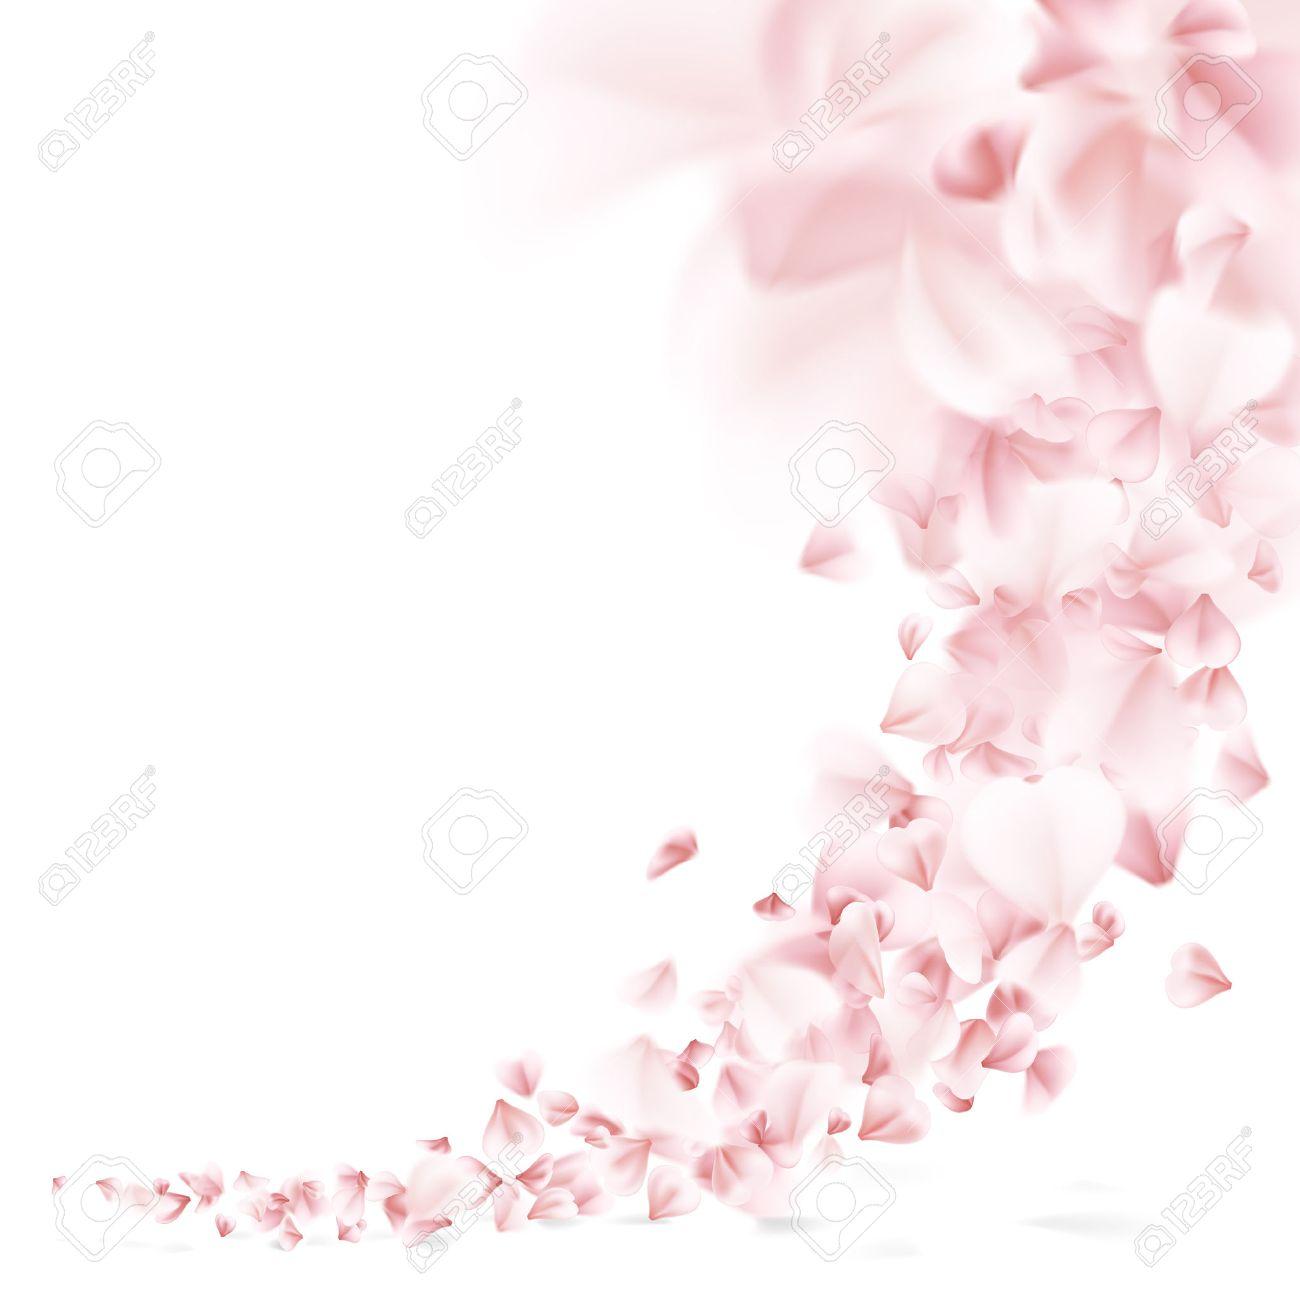 Sakura flying petals on white background. - 56755273